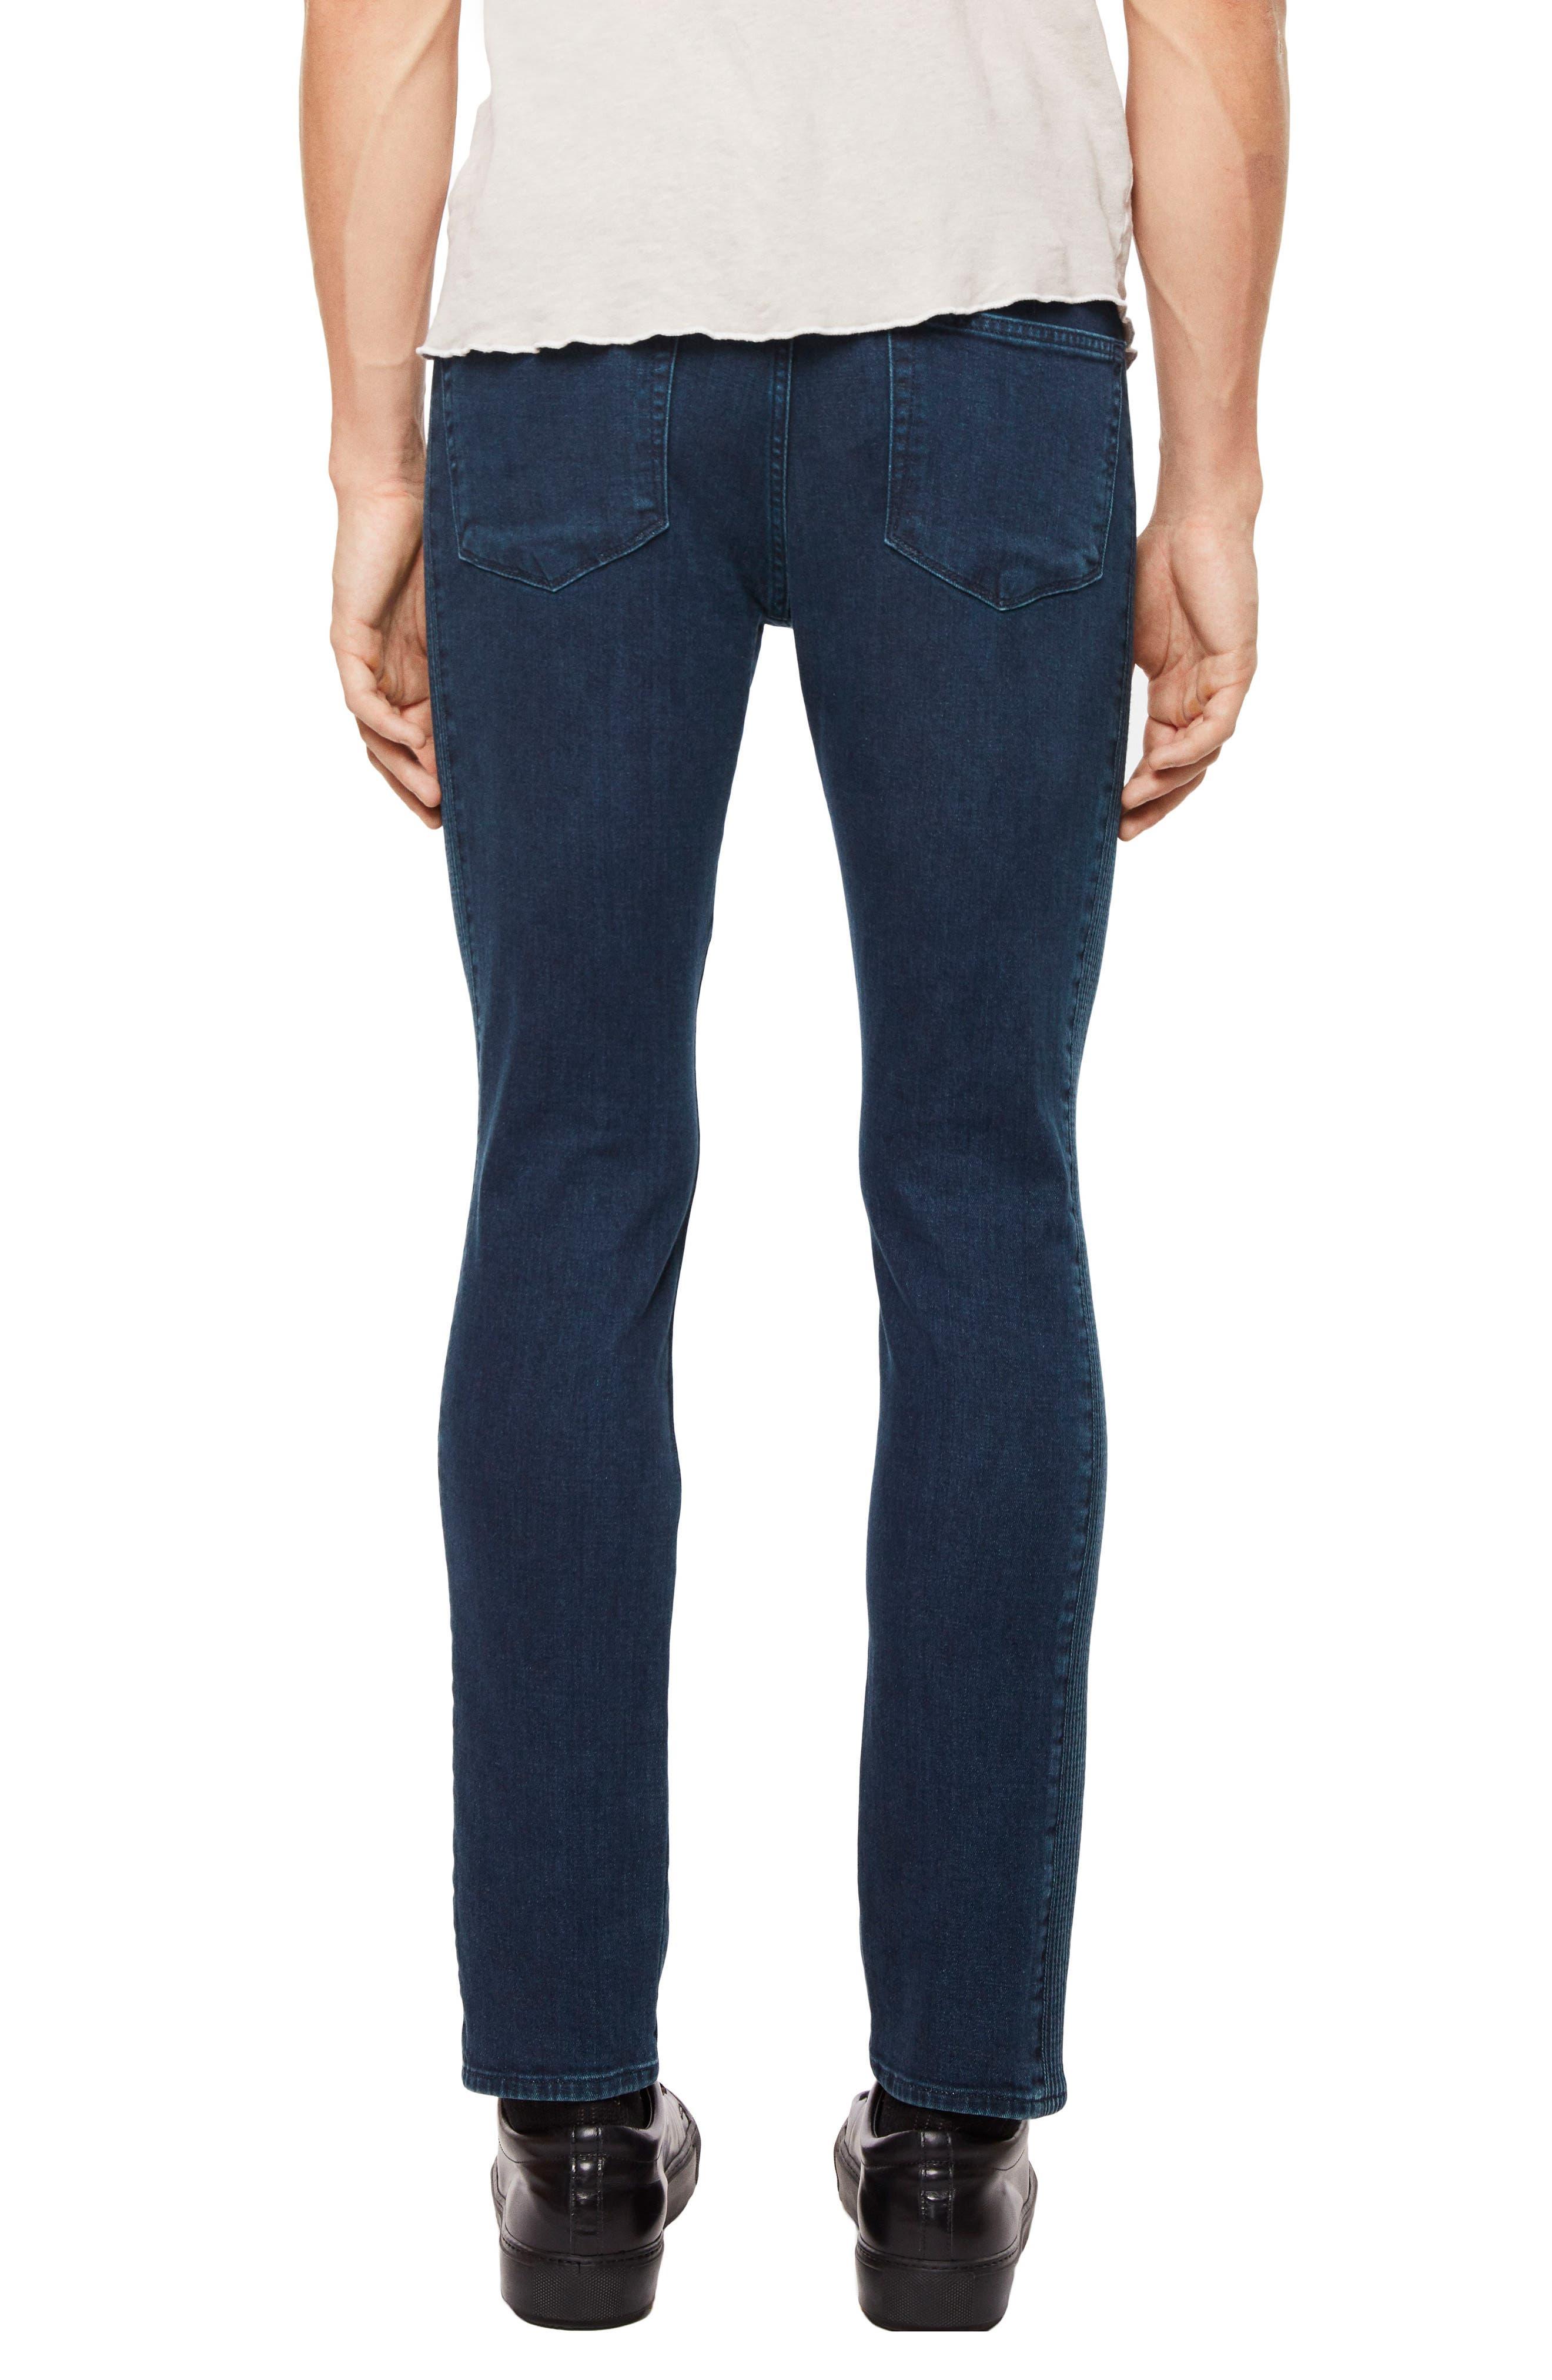 Moto Skinny Fit Jeans,                             Alternate thumbnail 2, color,                             403